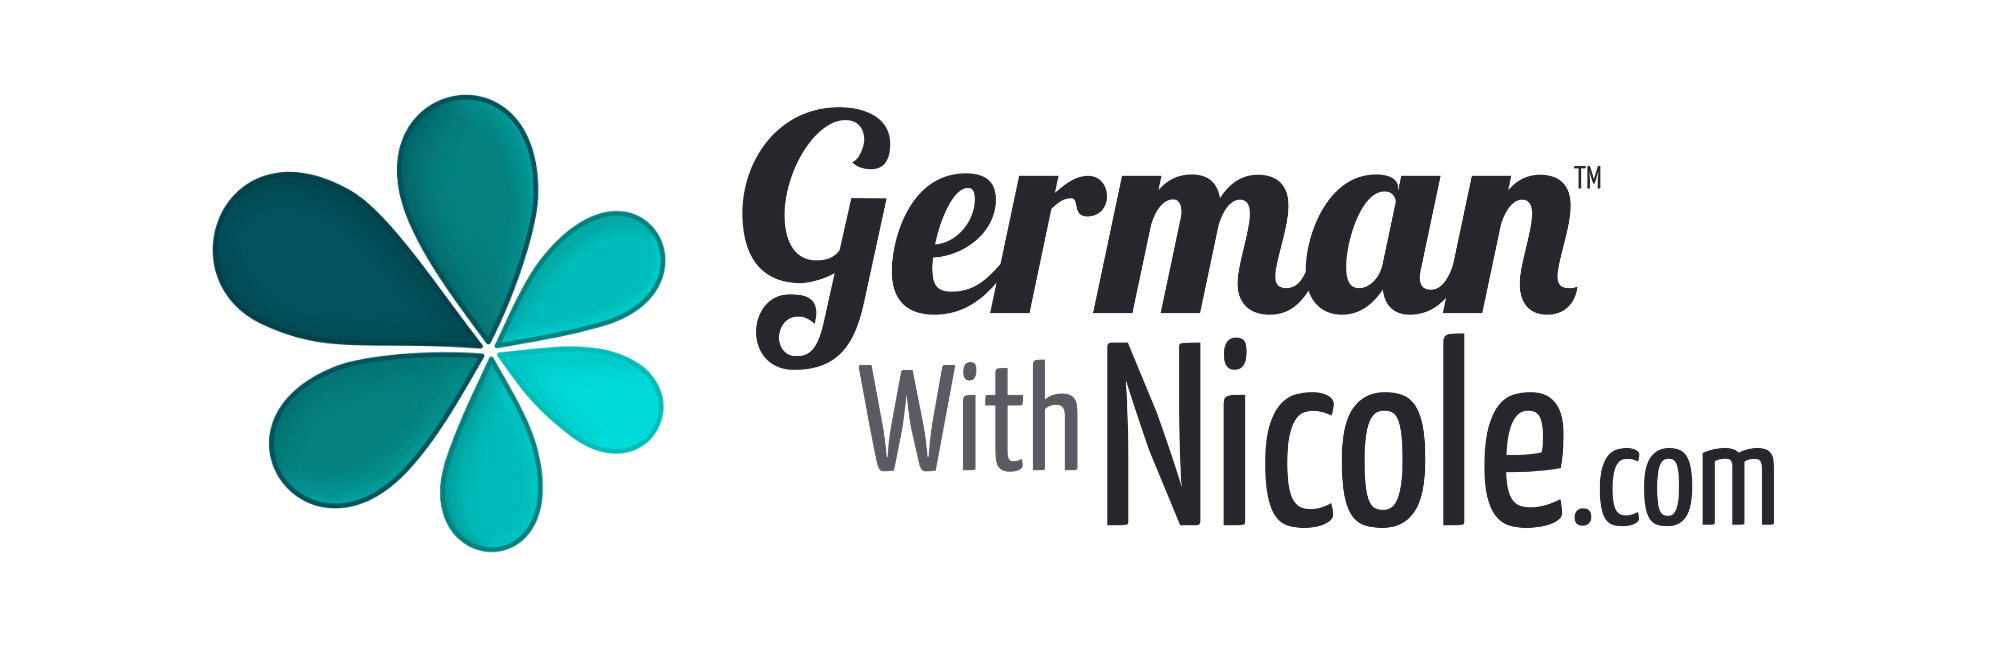 GermanWithNicole.com